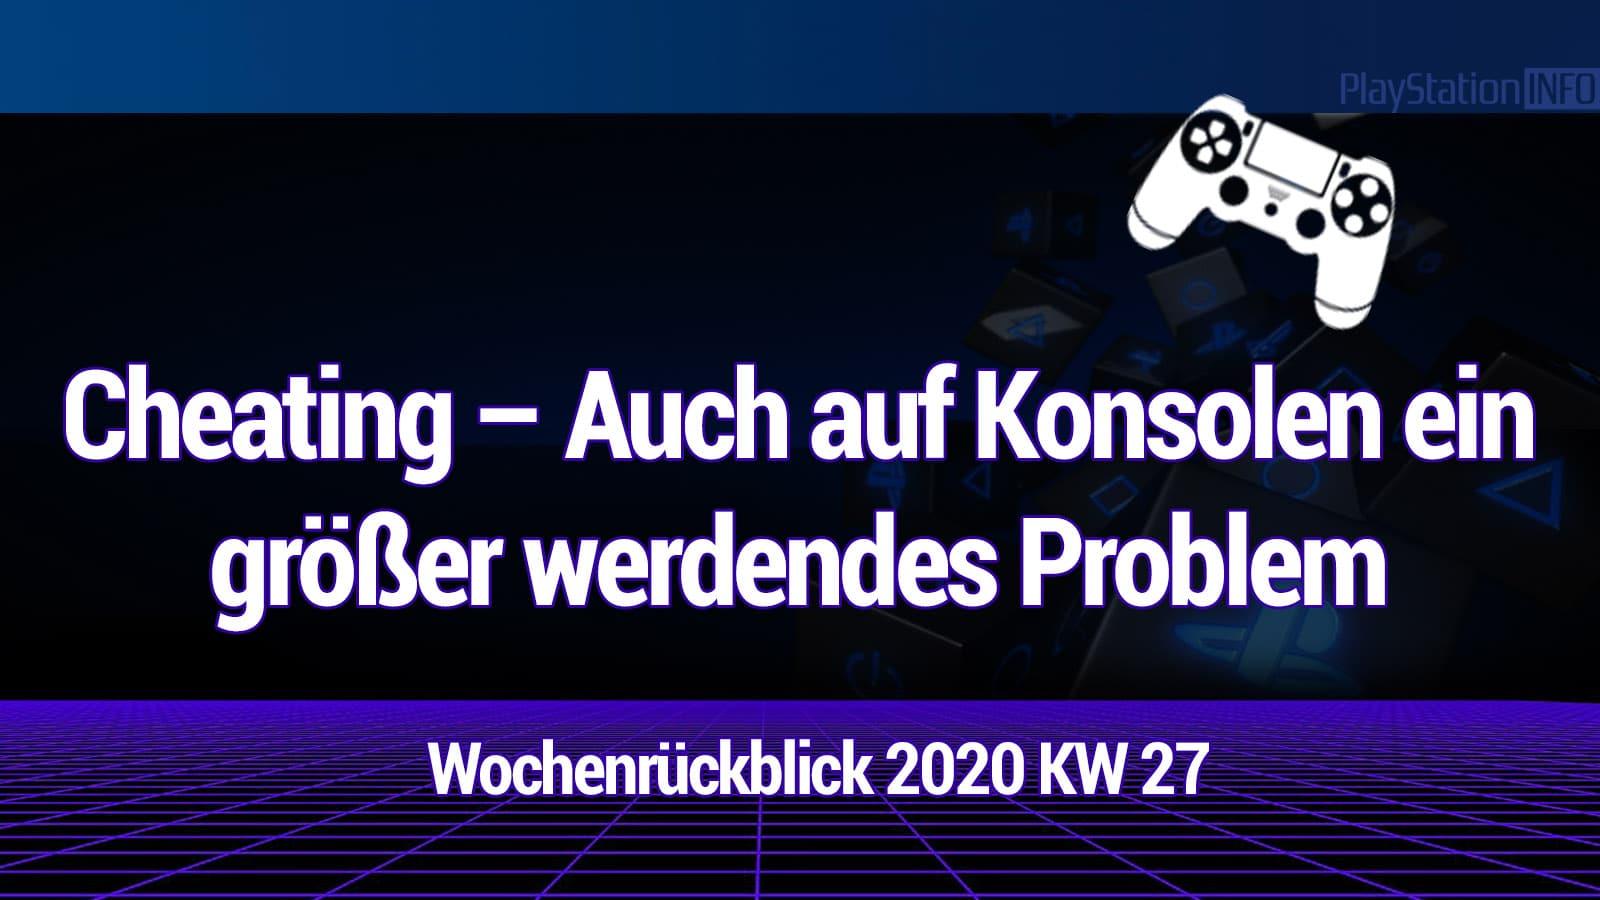 Kw 27 2020